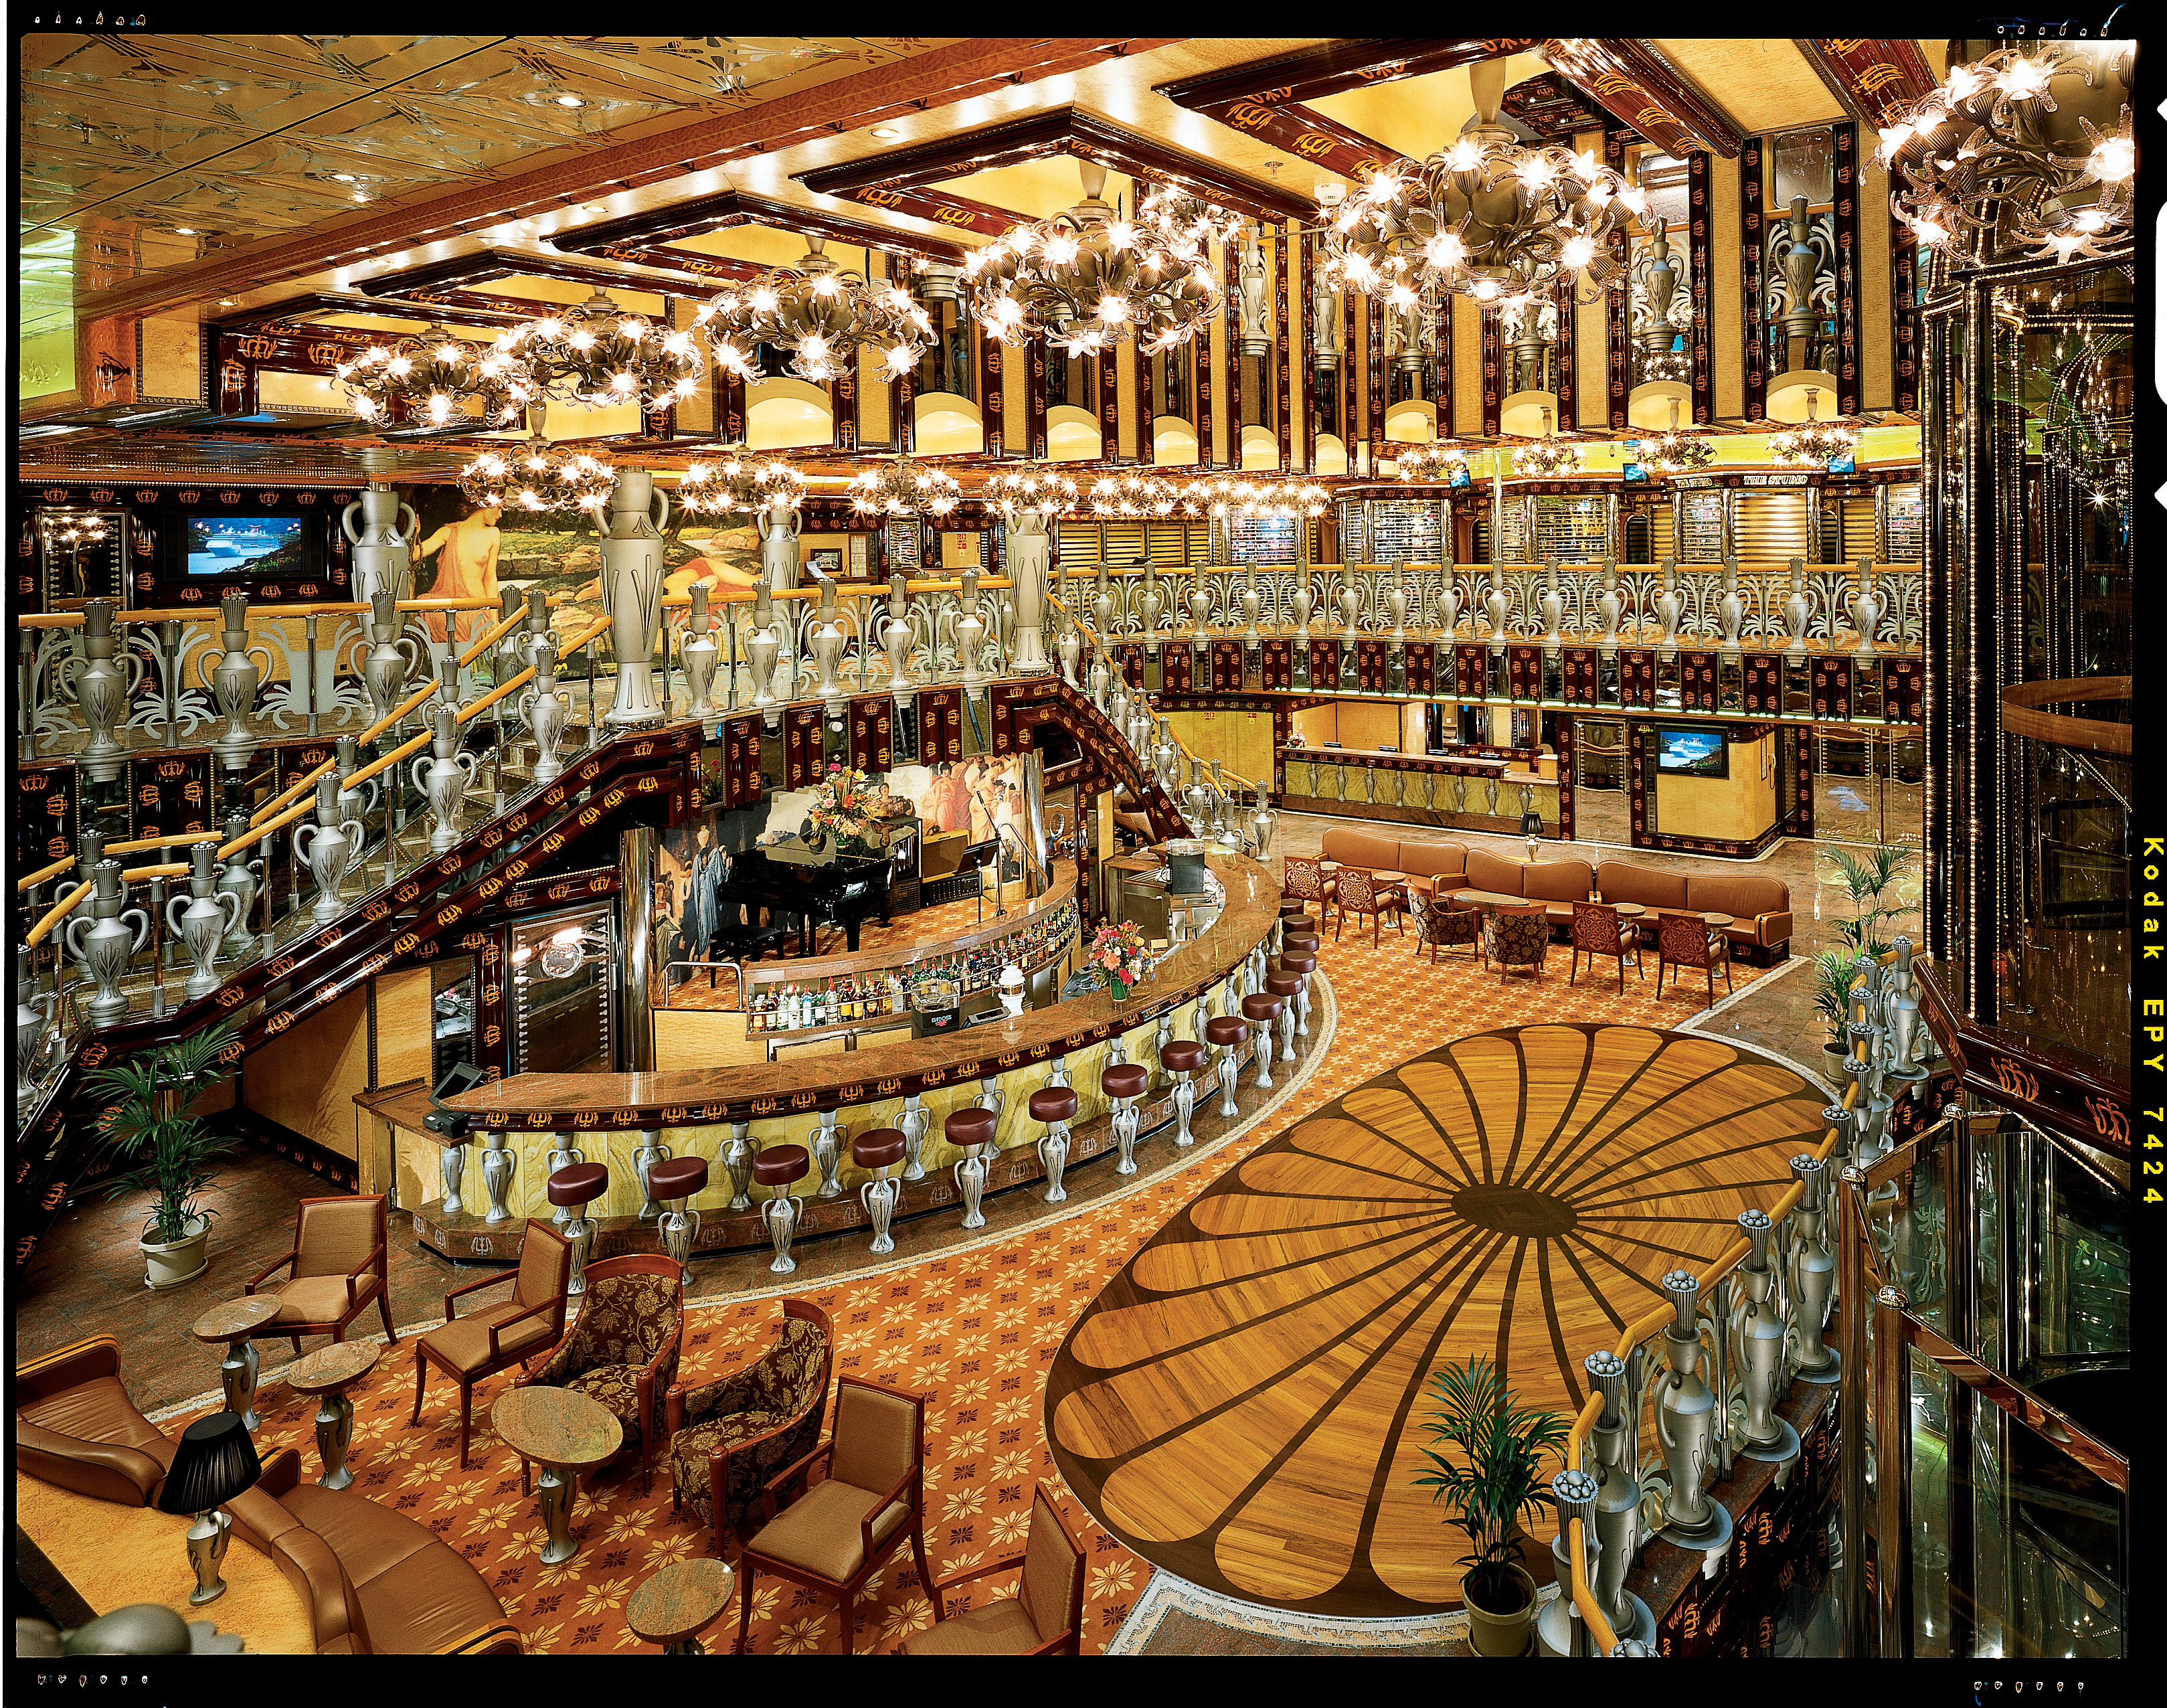 Carnival Legend Colossus Grand Atrium 1.jpg